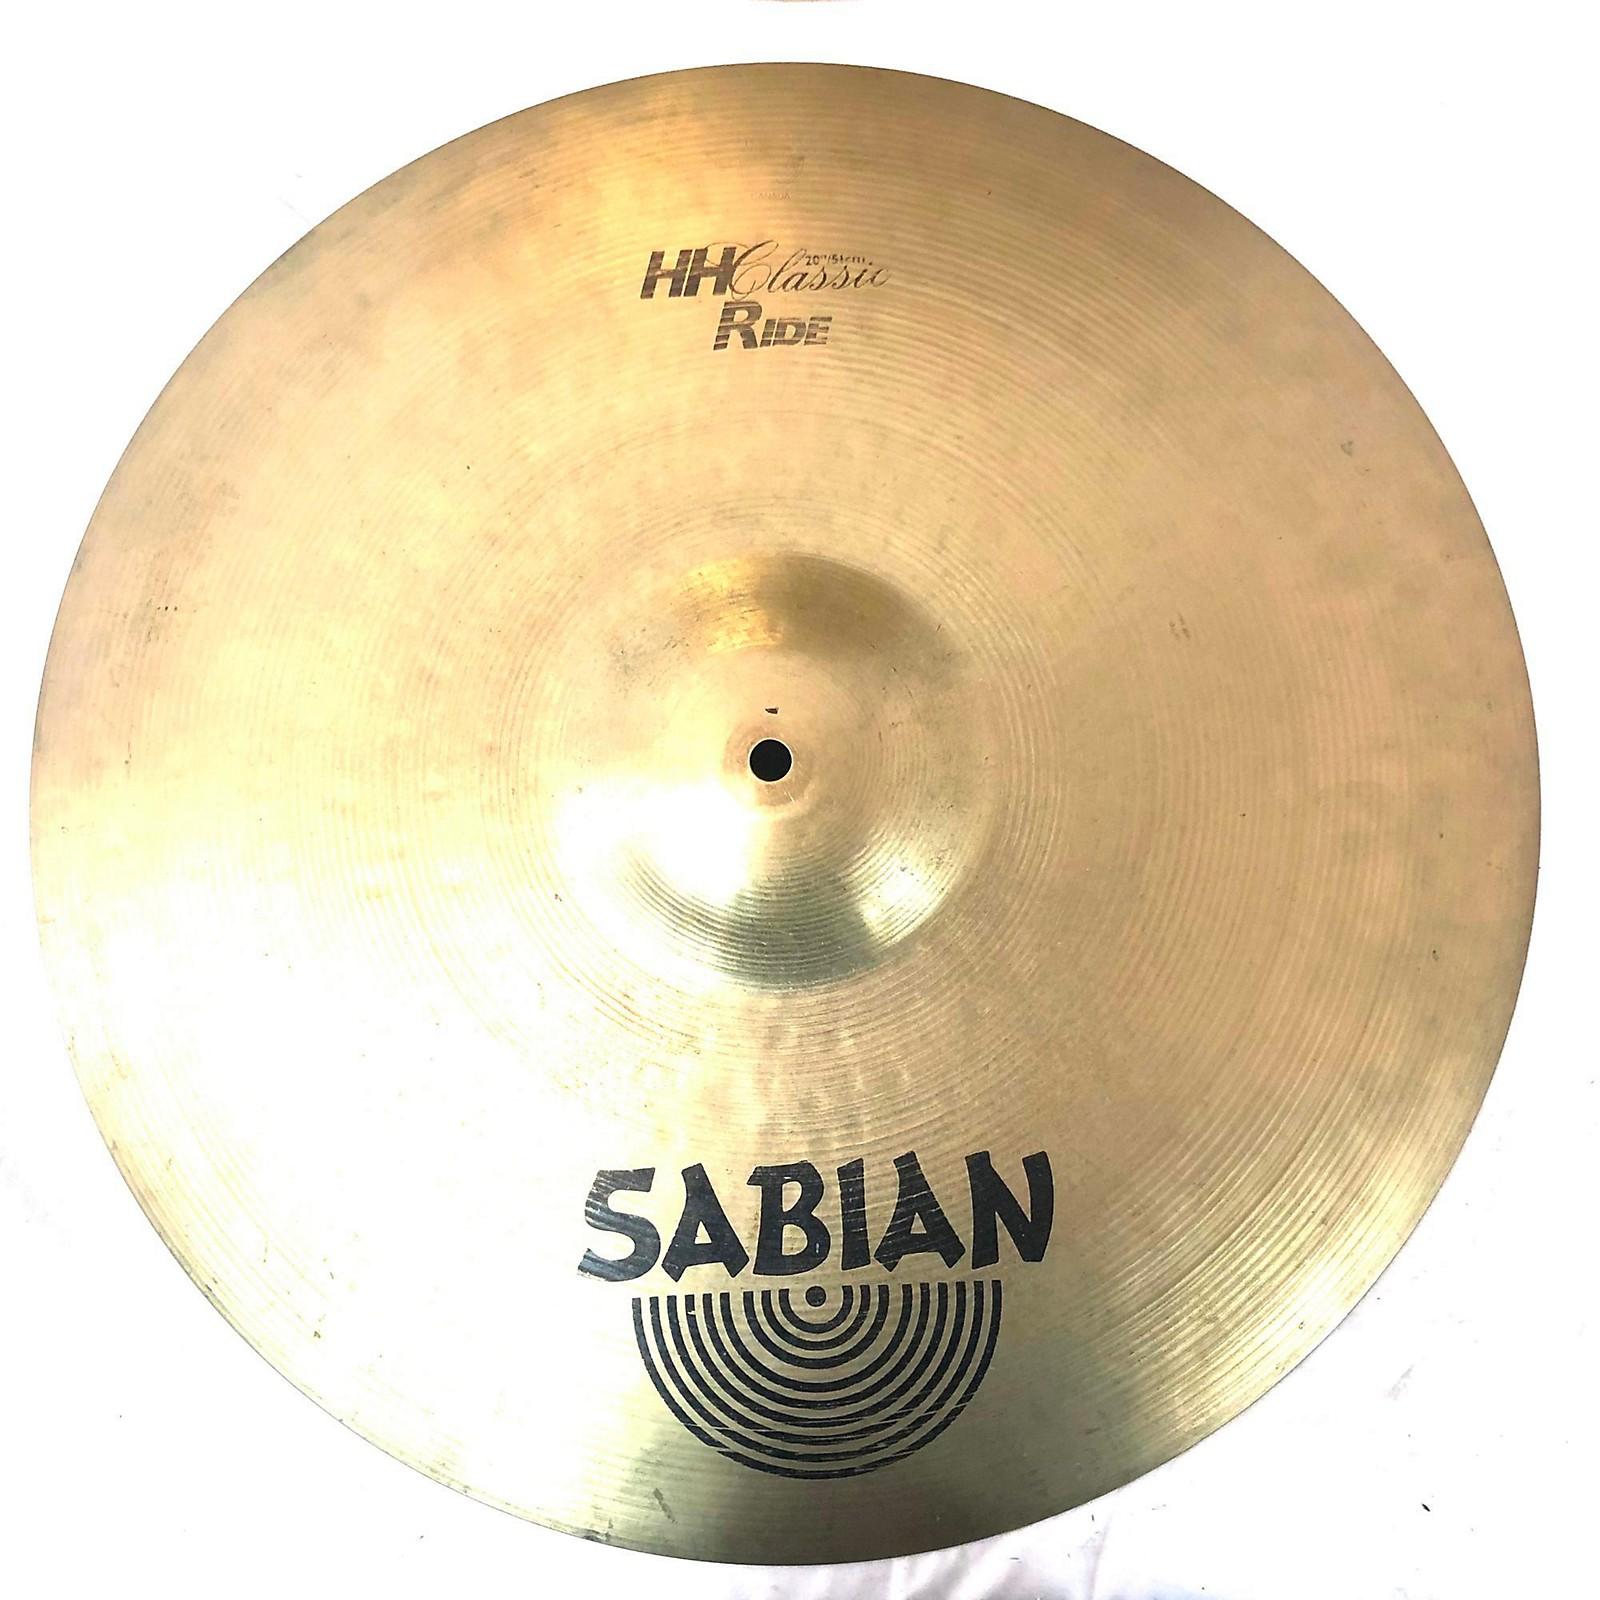 Sabian 20in HH Classic Ride Cymbal